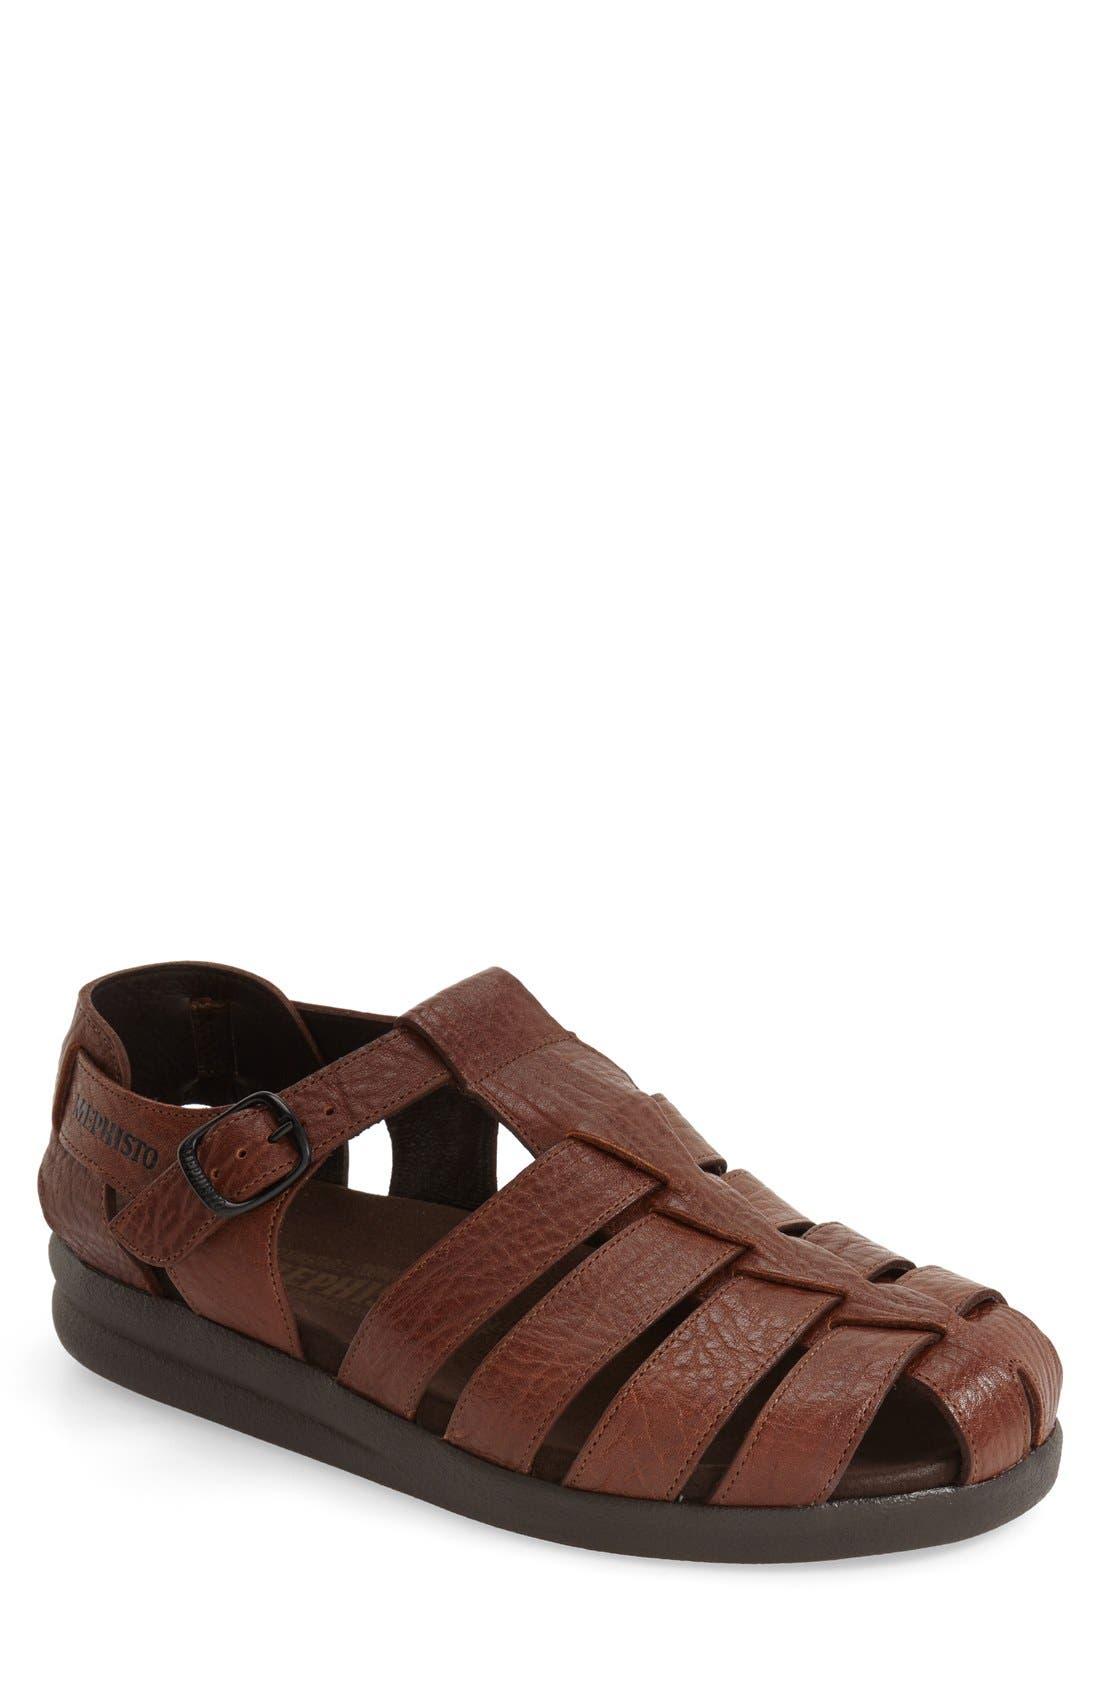 MEPHISTO 'Sam' Sandal, Main, color, TAN